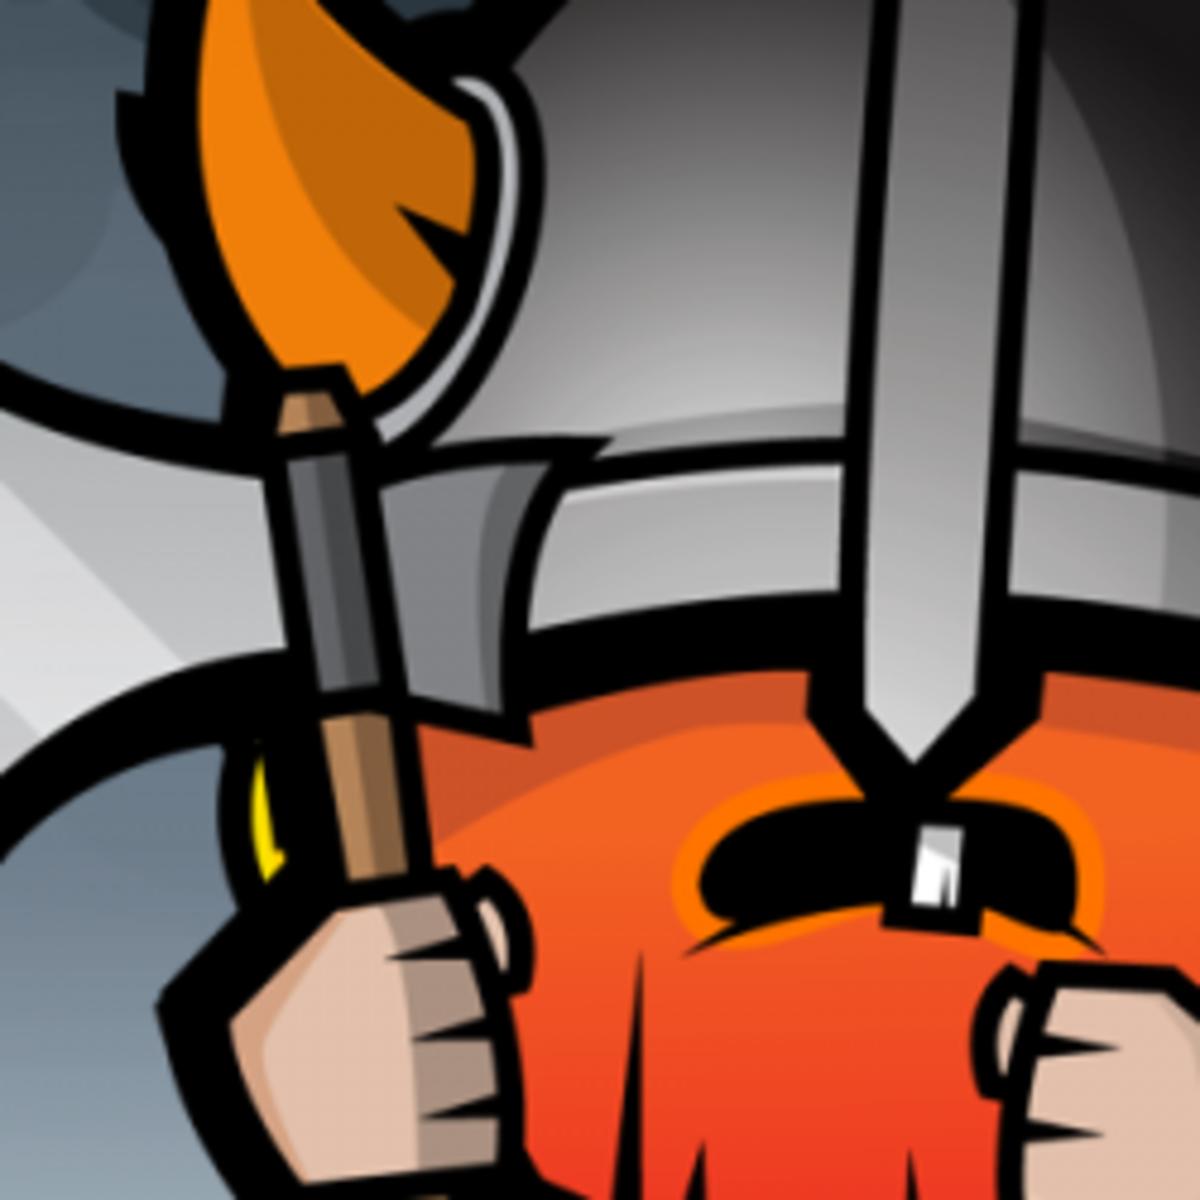 siege-hero